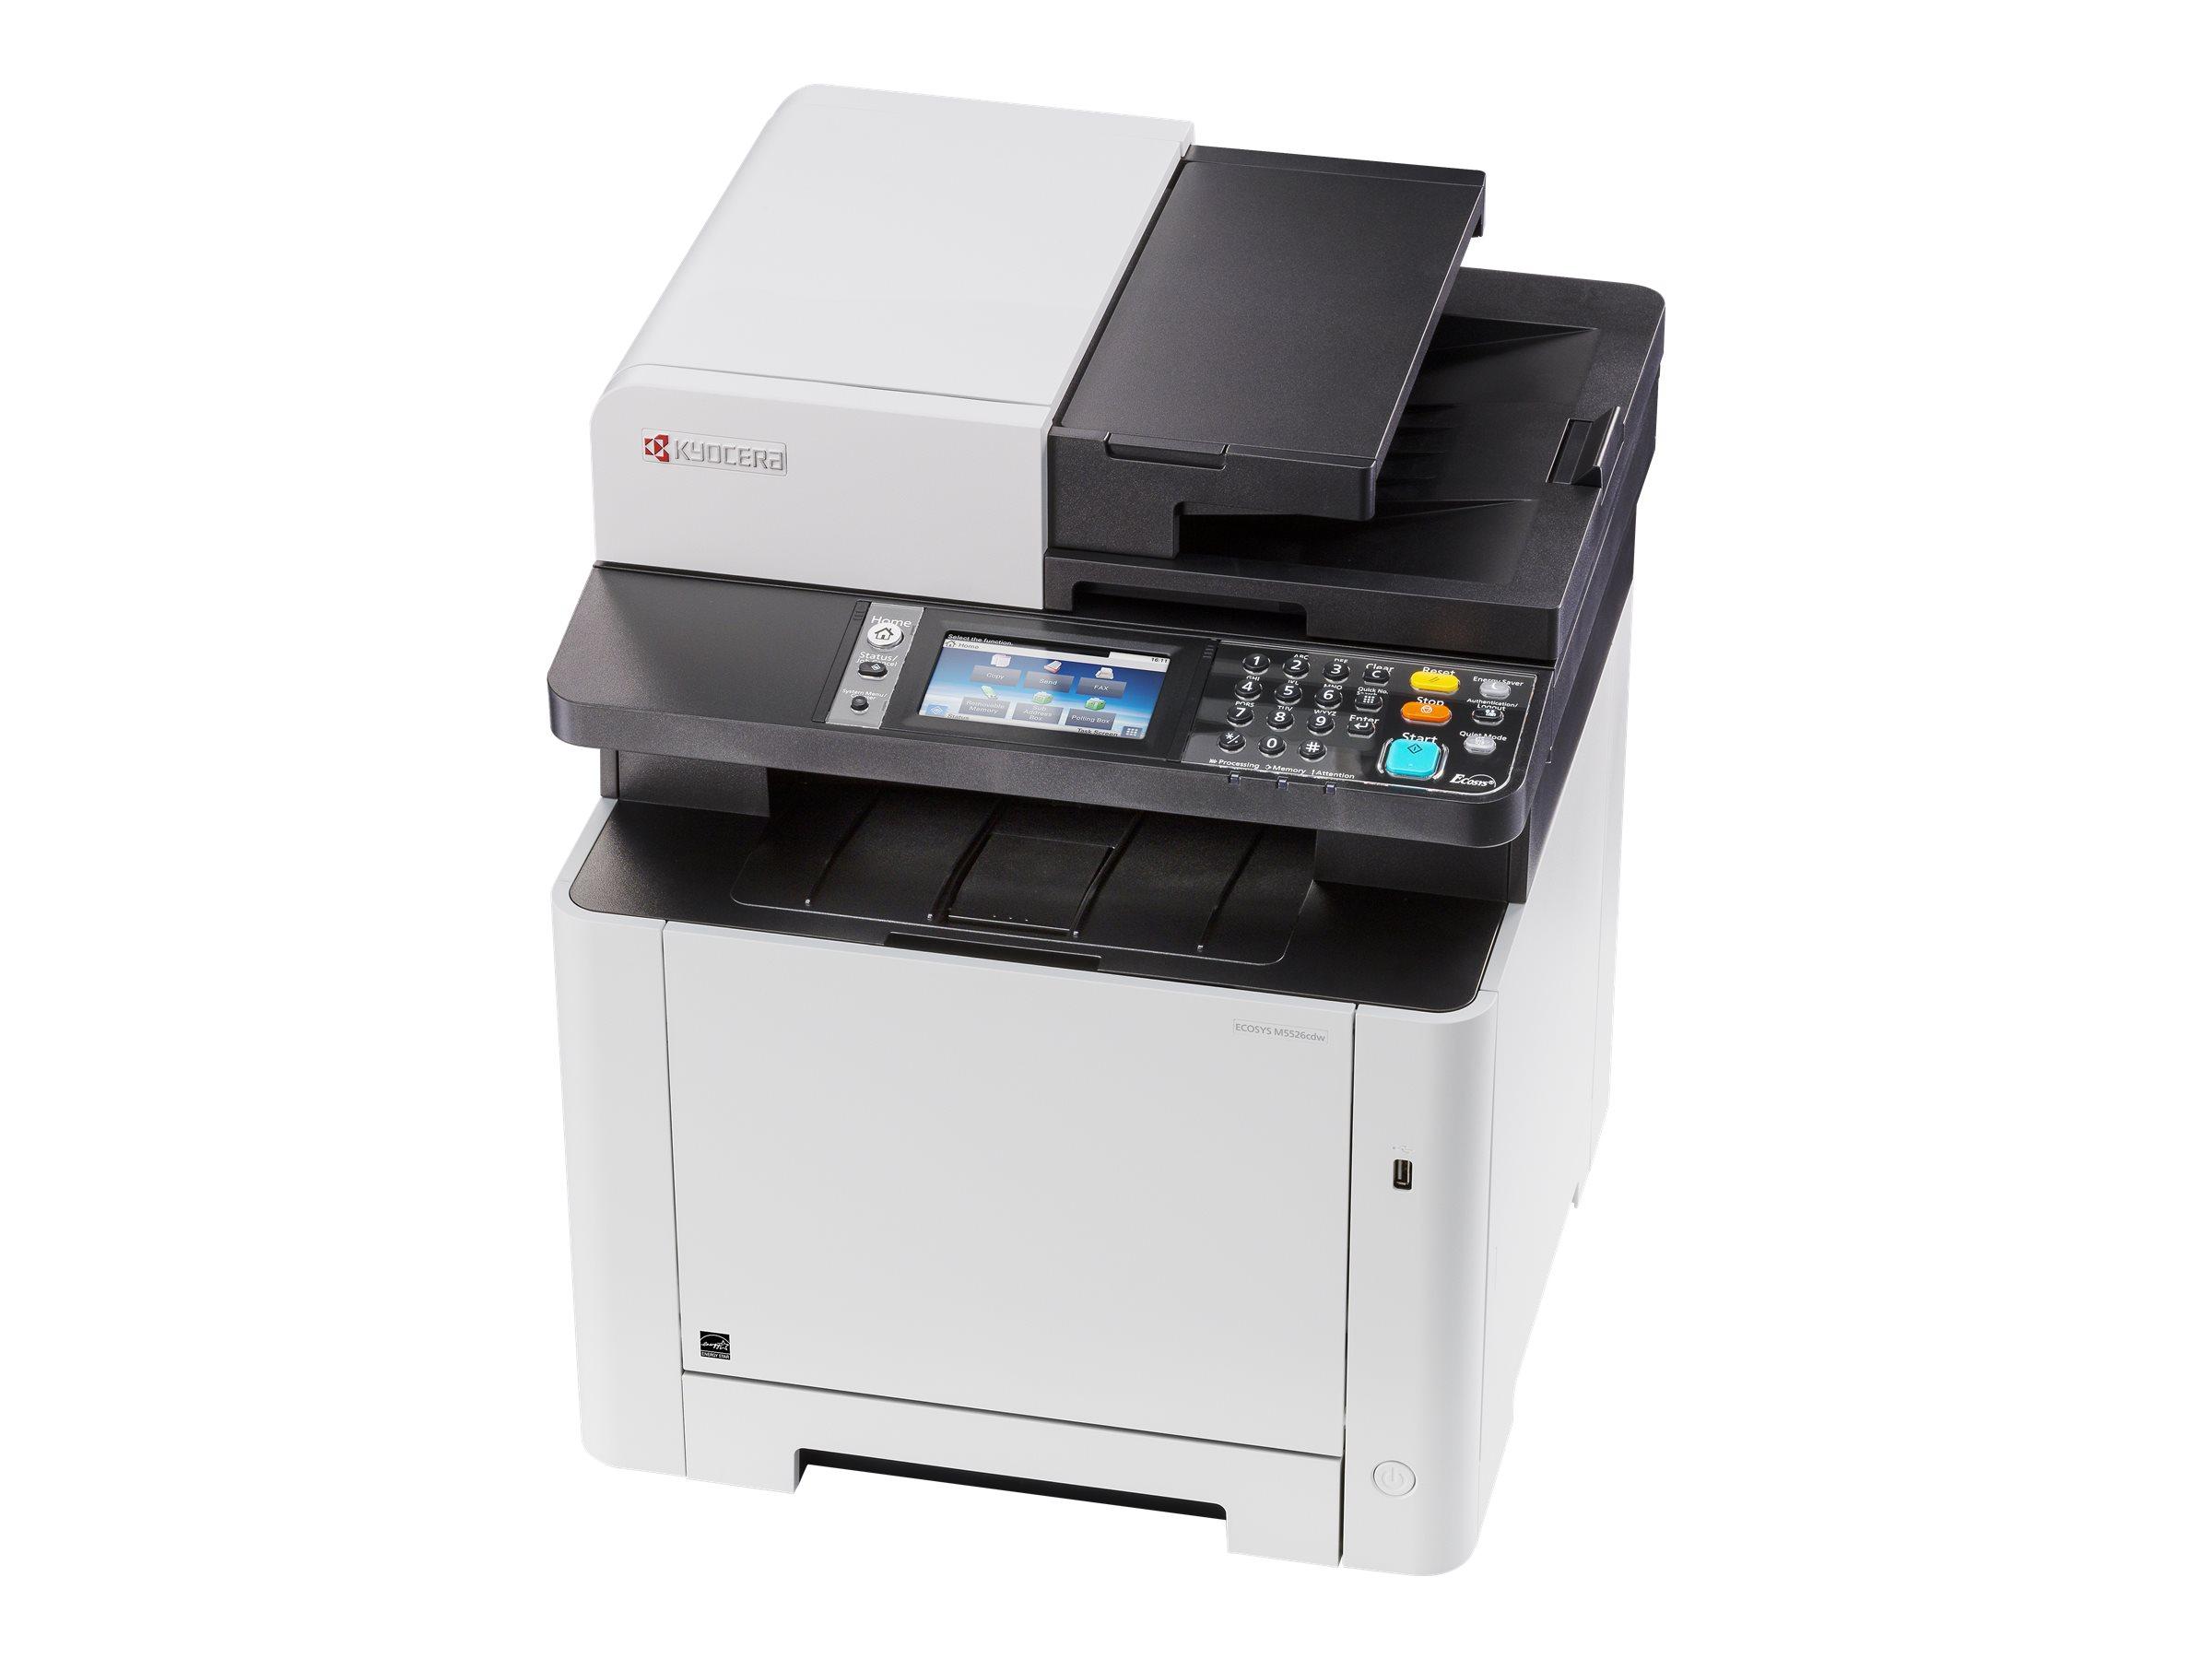 Kyocera ECOSYS M5526cdw - Multifunktionsdrucker - Farbe - Laser - Legal (216 x 356 mm)/A4 (210 x 297 mm) (Original) - A4/Legal (